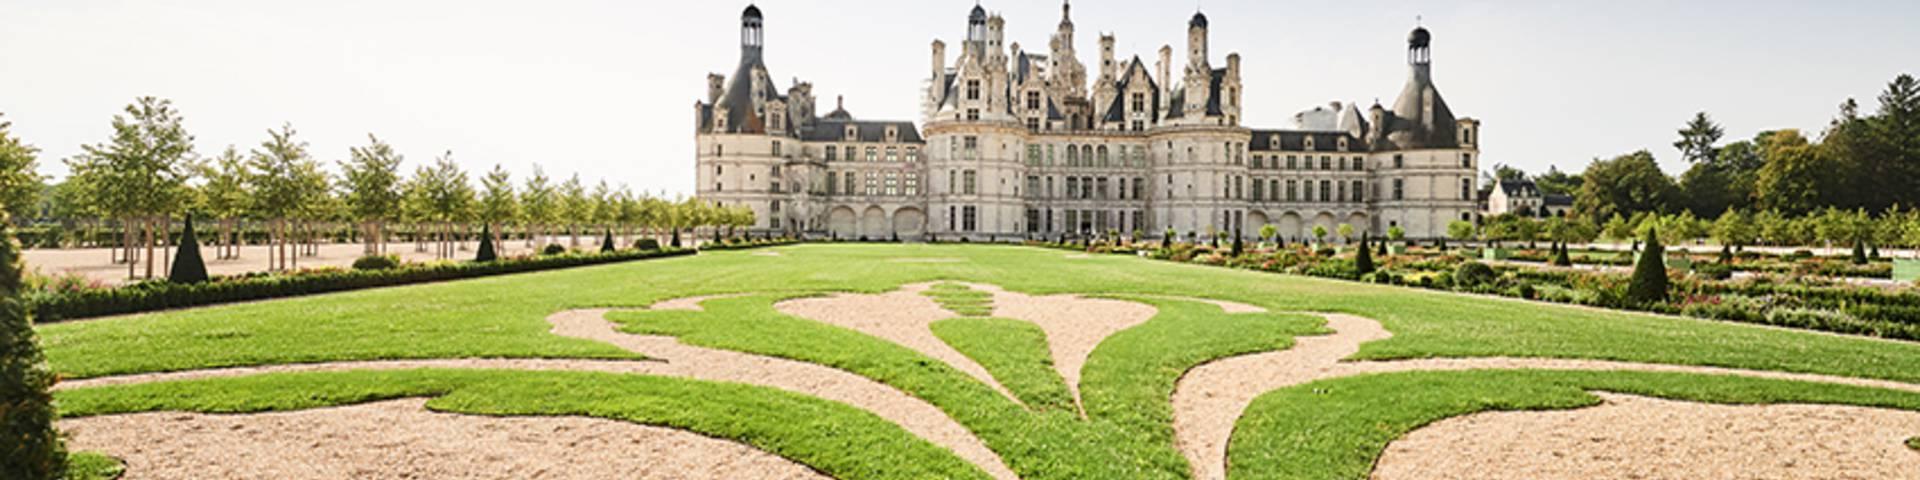 Chambord et ses jardins_© Benjamin Brolet